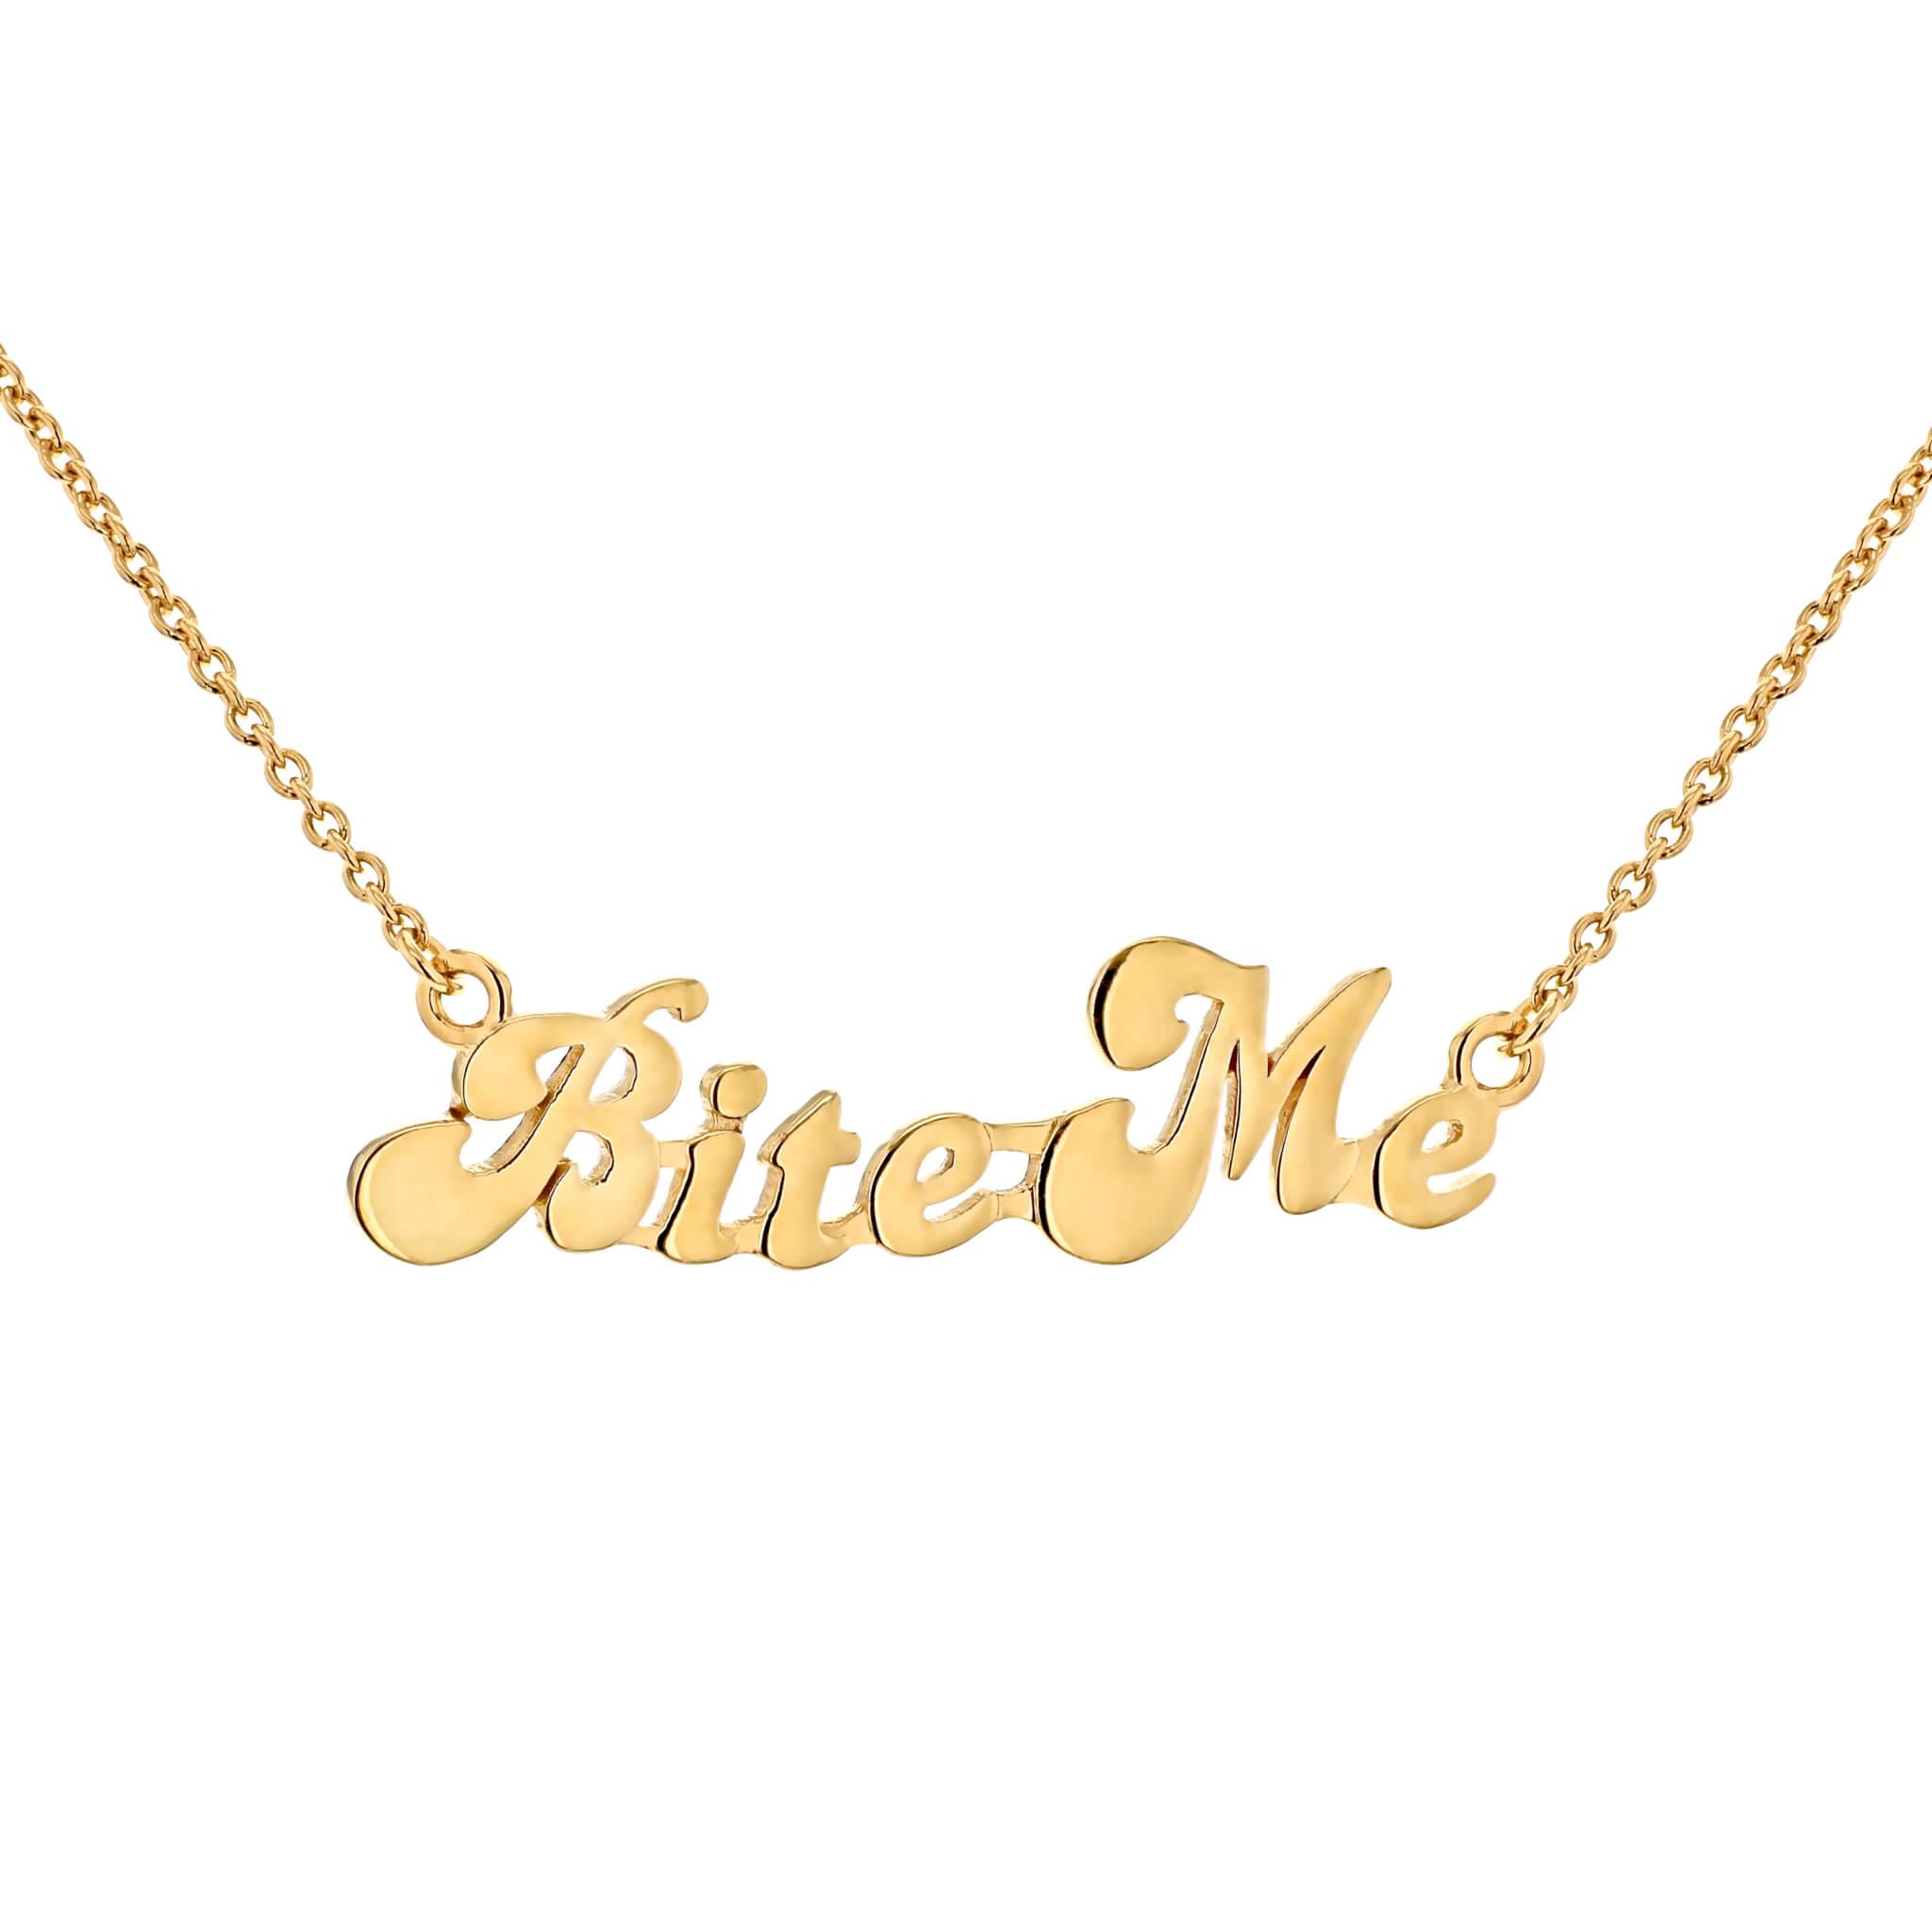 BITE ME necklace2